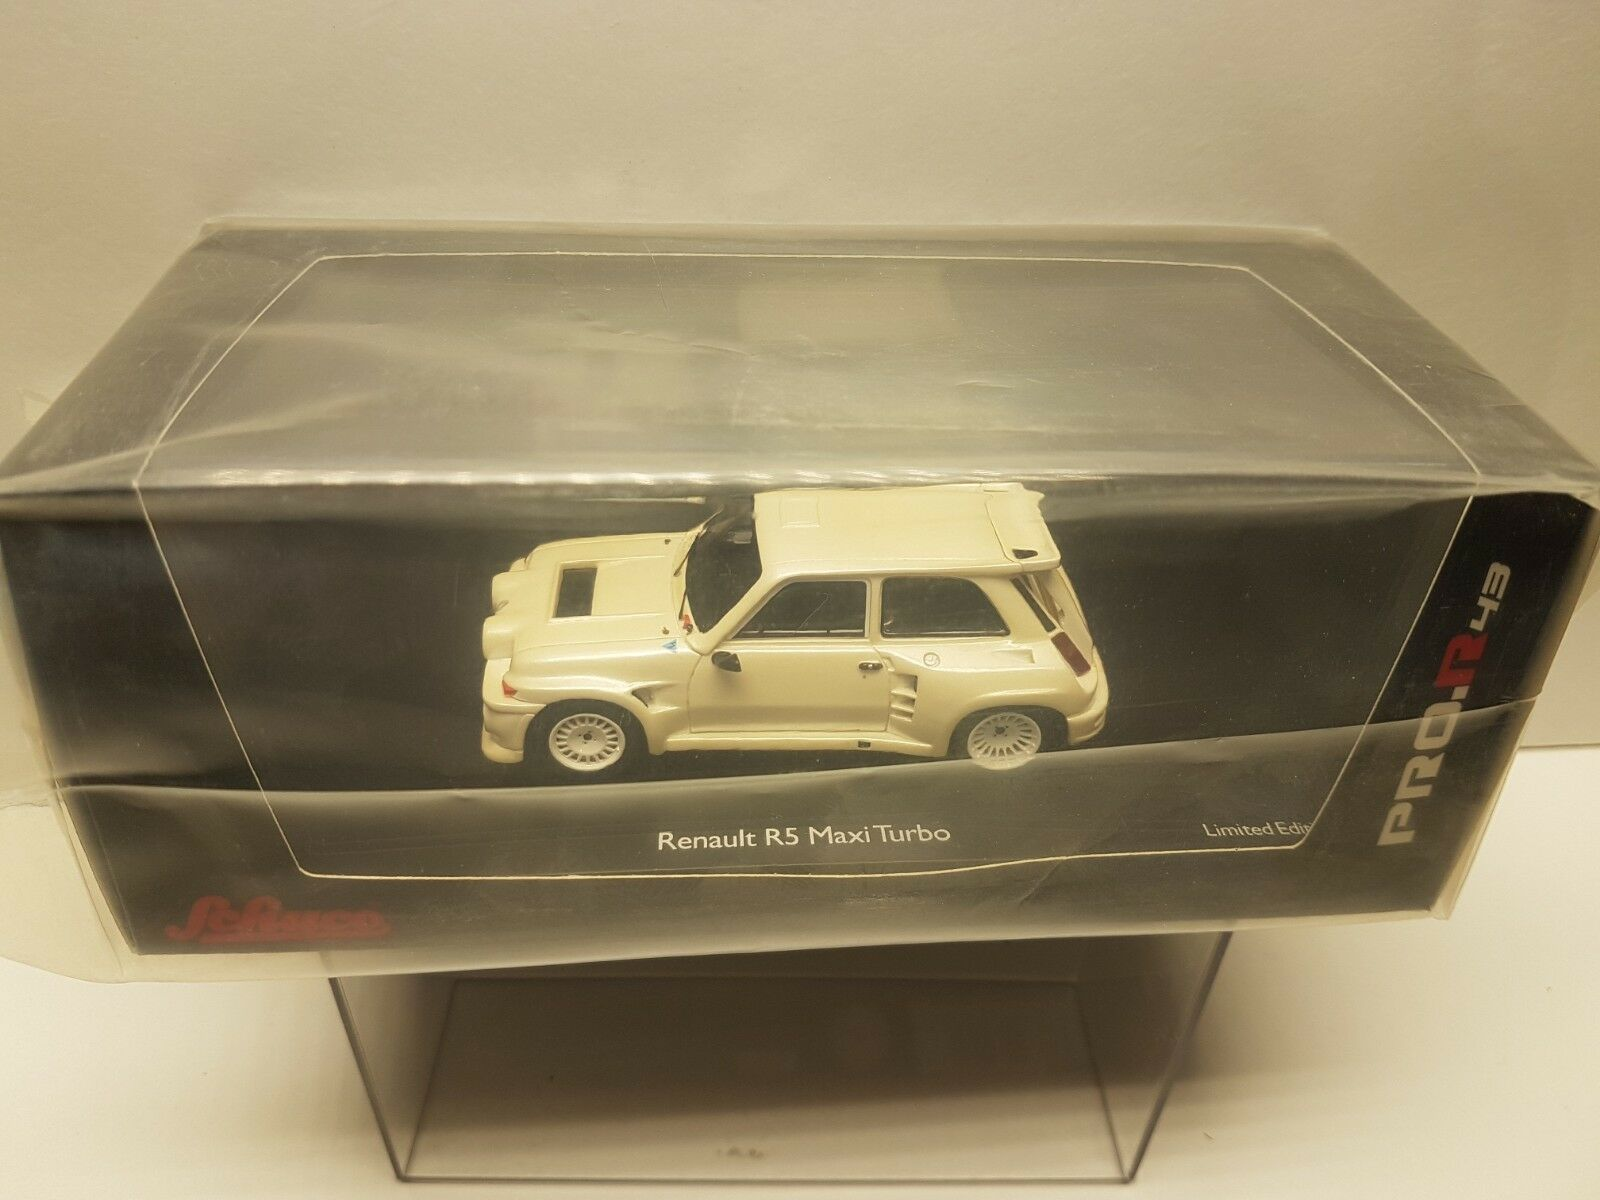 Renault 5 turbo schucco 450885500 maxi